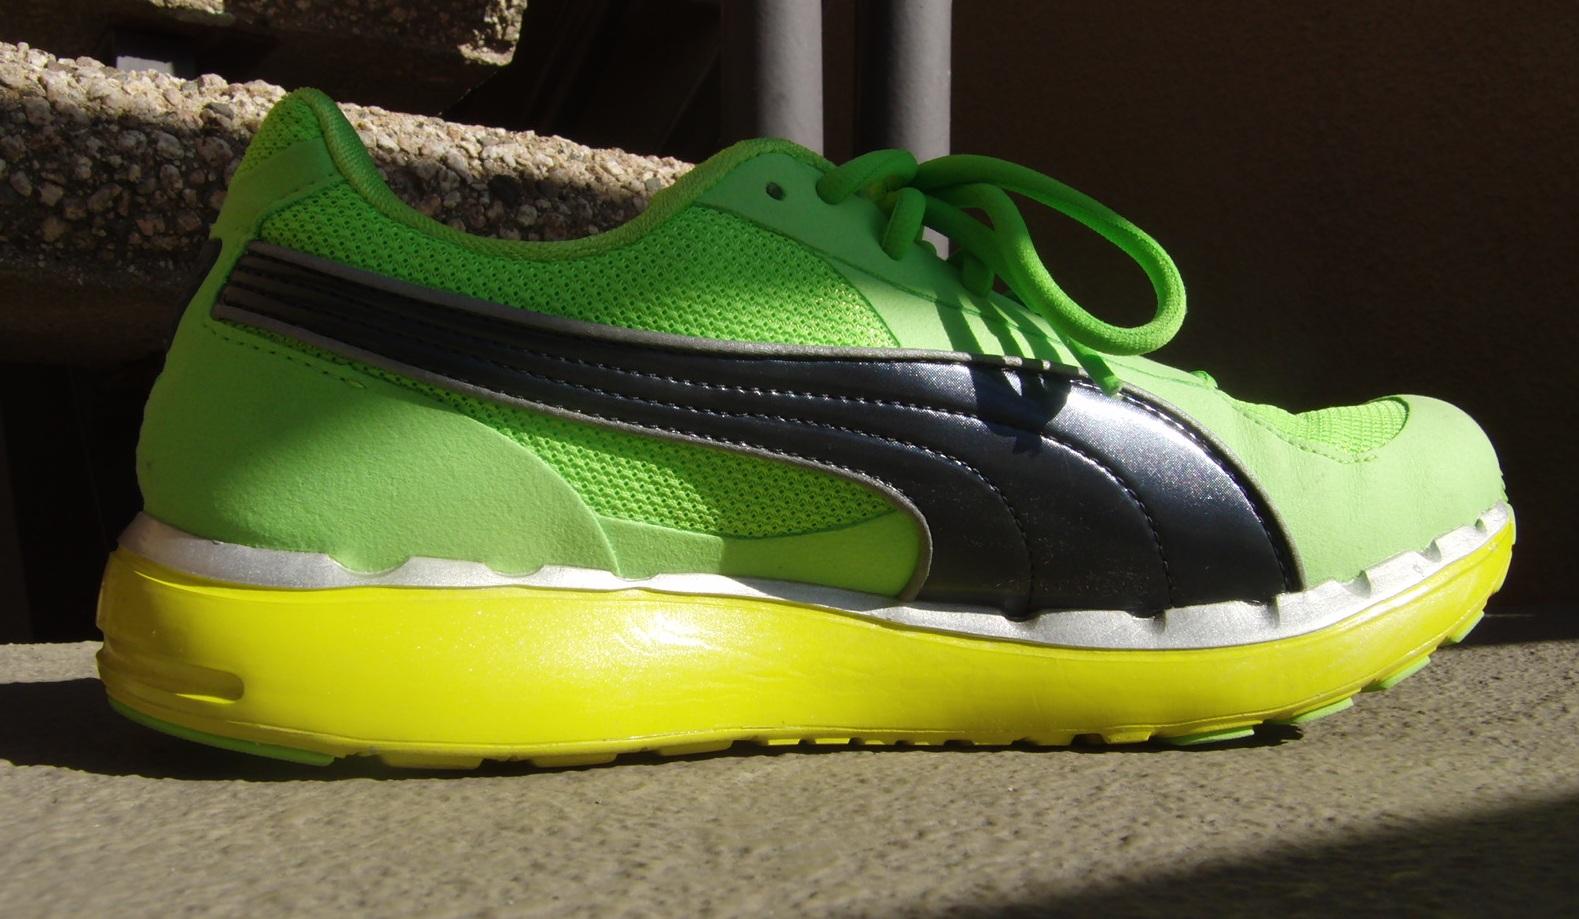 ... Running Casual or Fashion Shoes CP Men size Puma Faas 500 BioRide ... 0f2757375